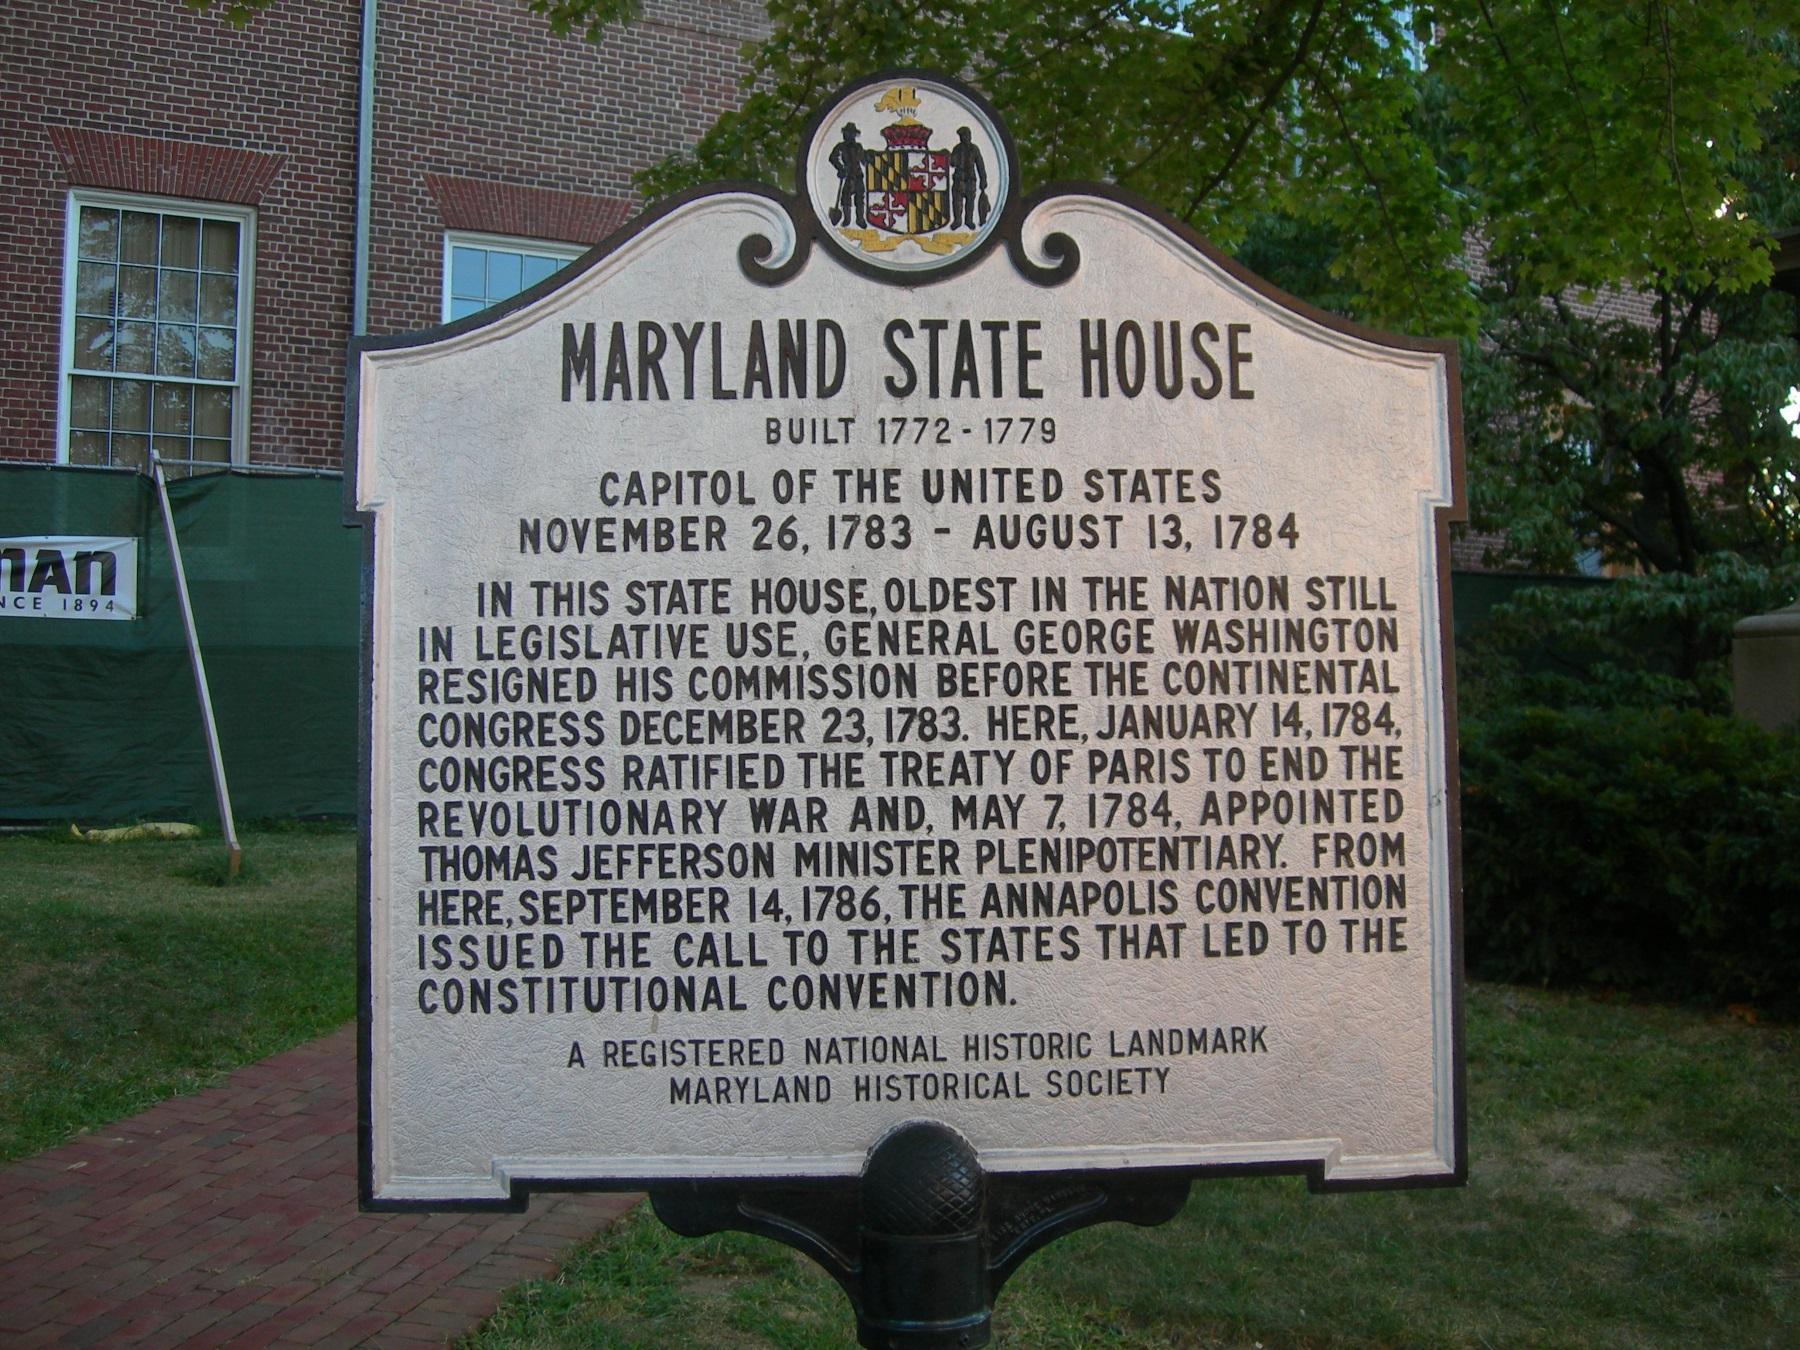 maryland_state_house.jpg